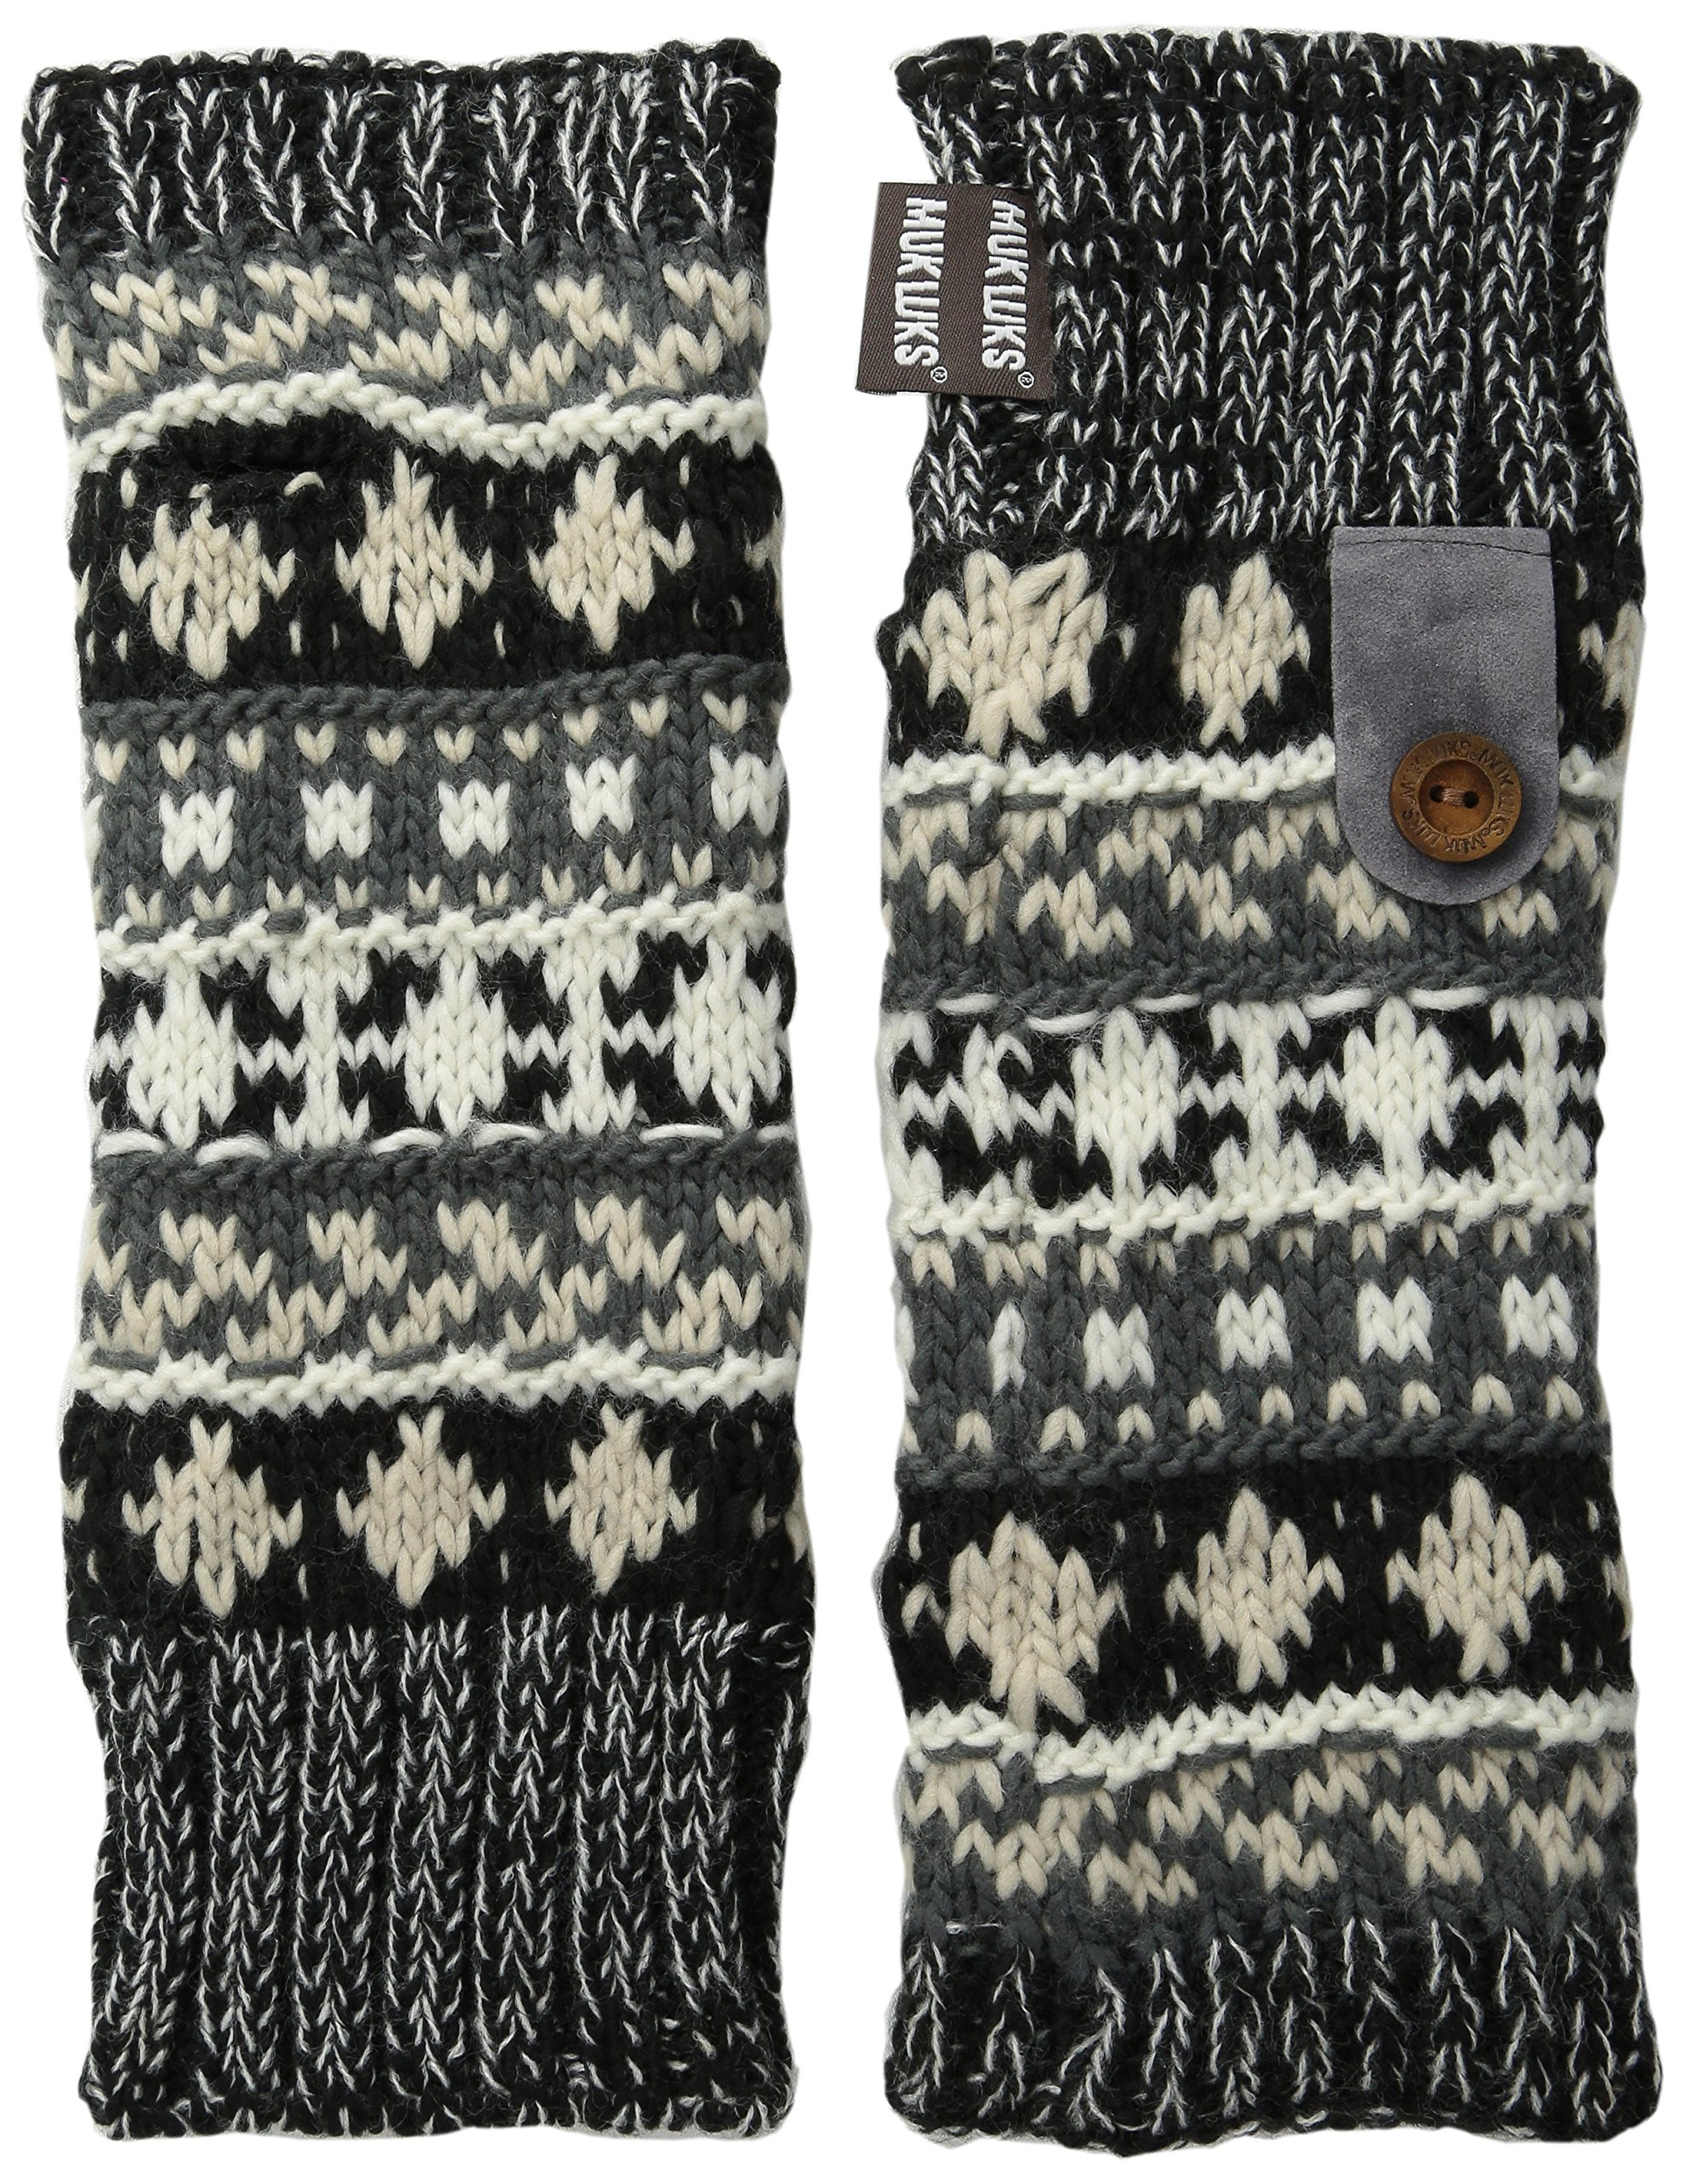 Muk Luks Women's Armwarmers, Dark Gray/Black, One Size